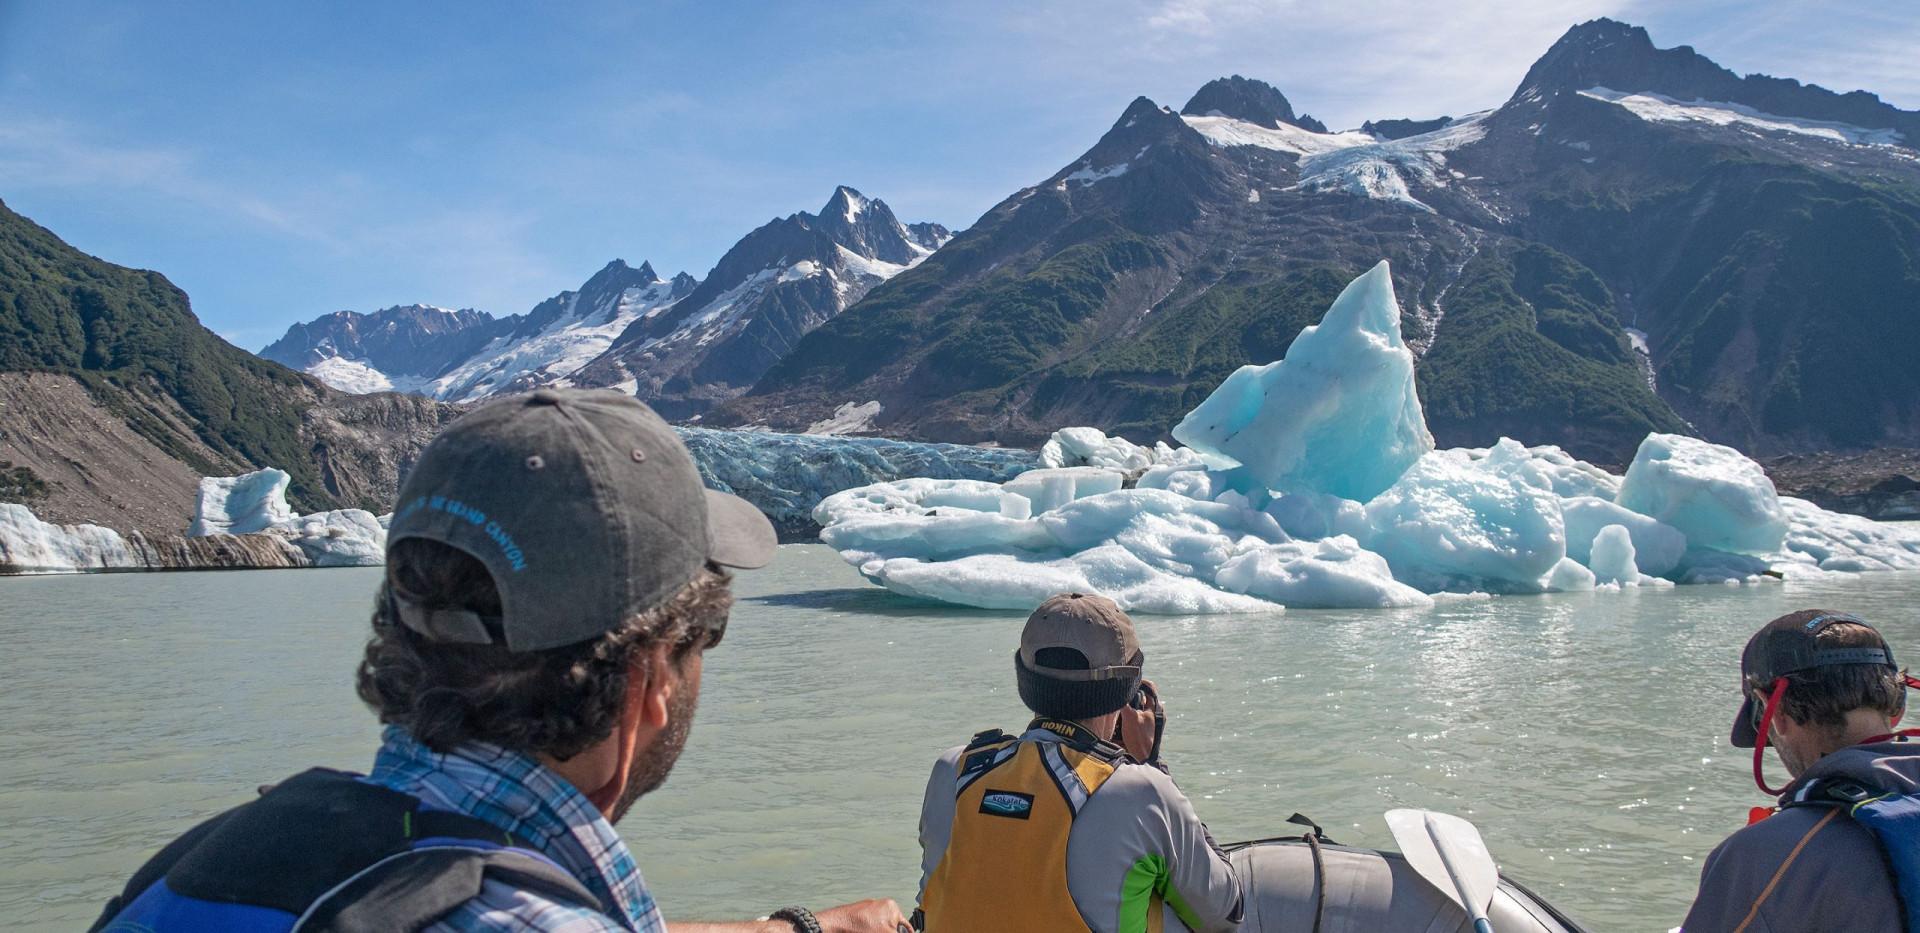 Tatshenshini River Rafting - Walker Glacier - Icebergs